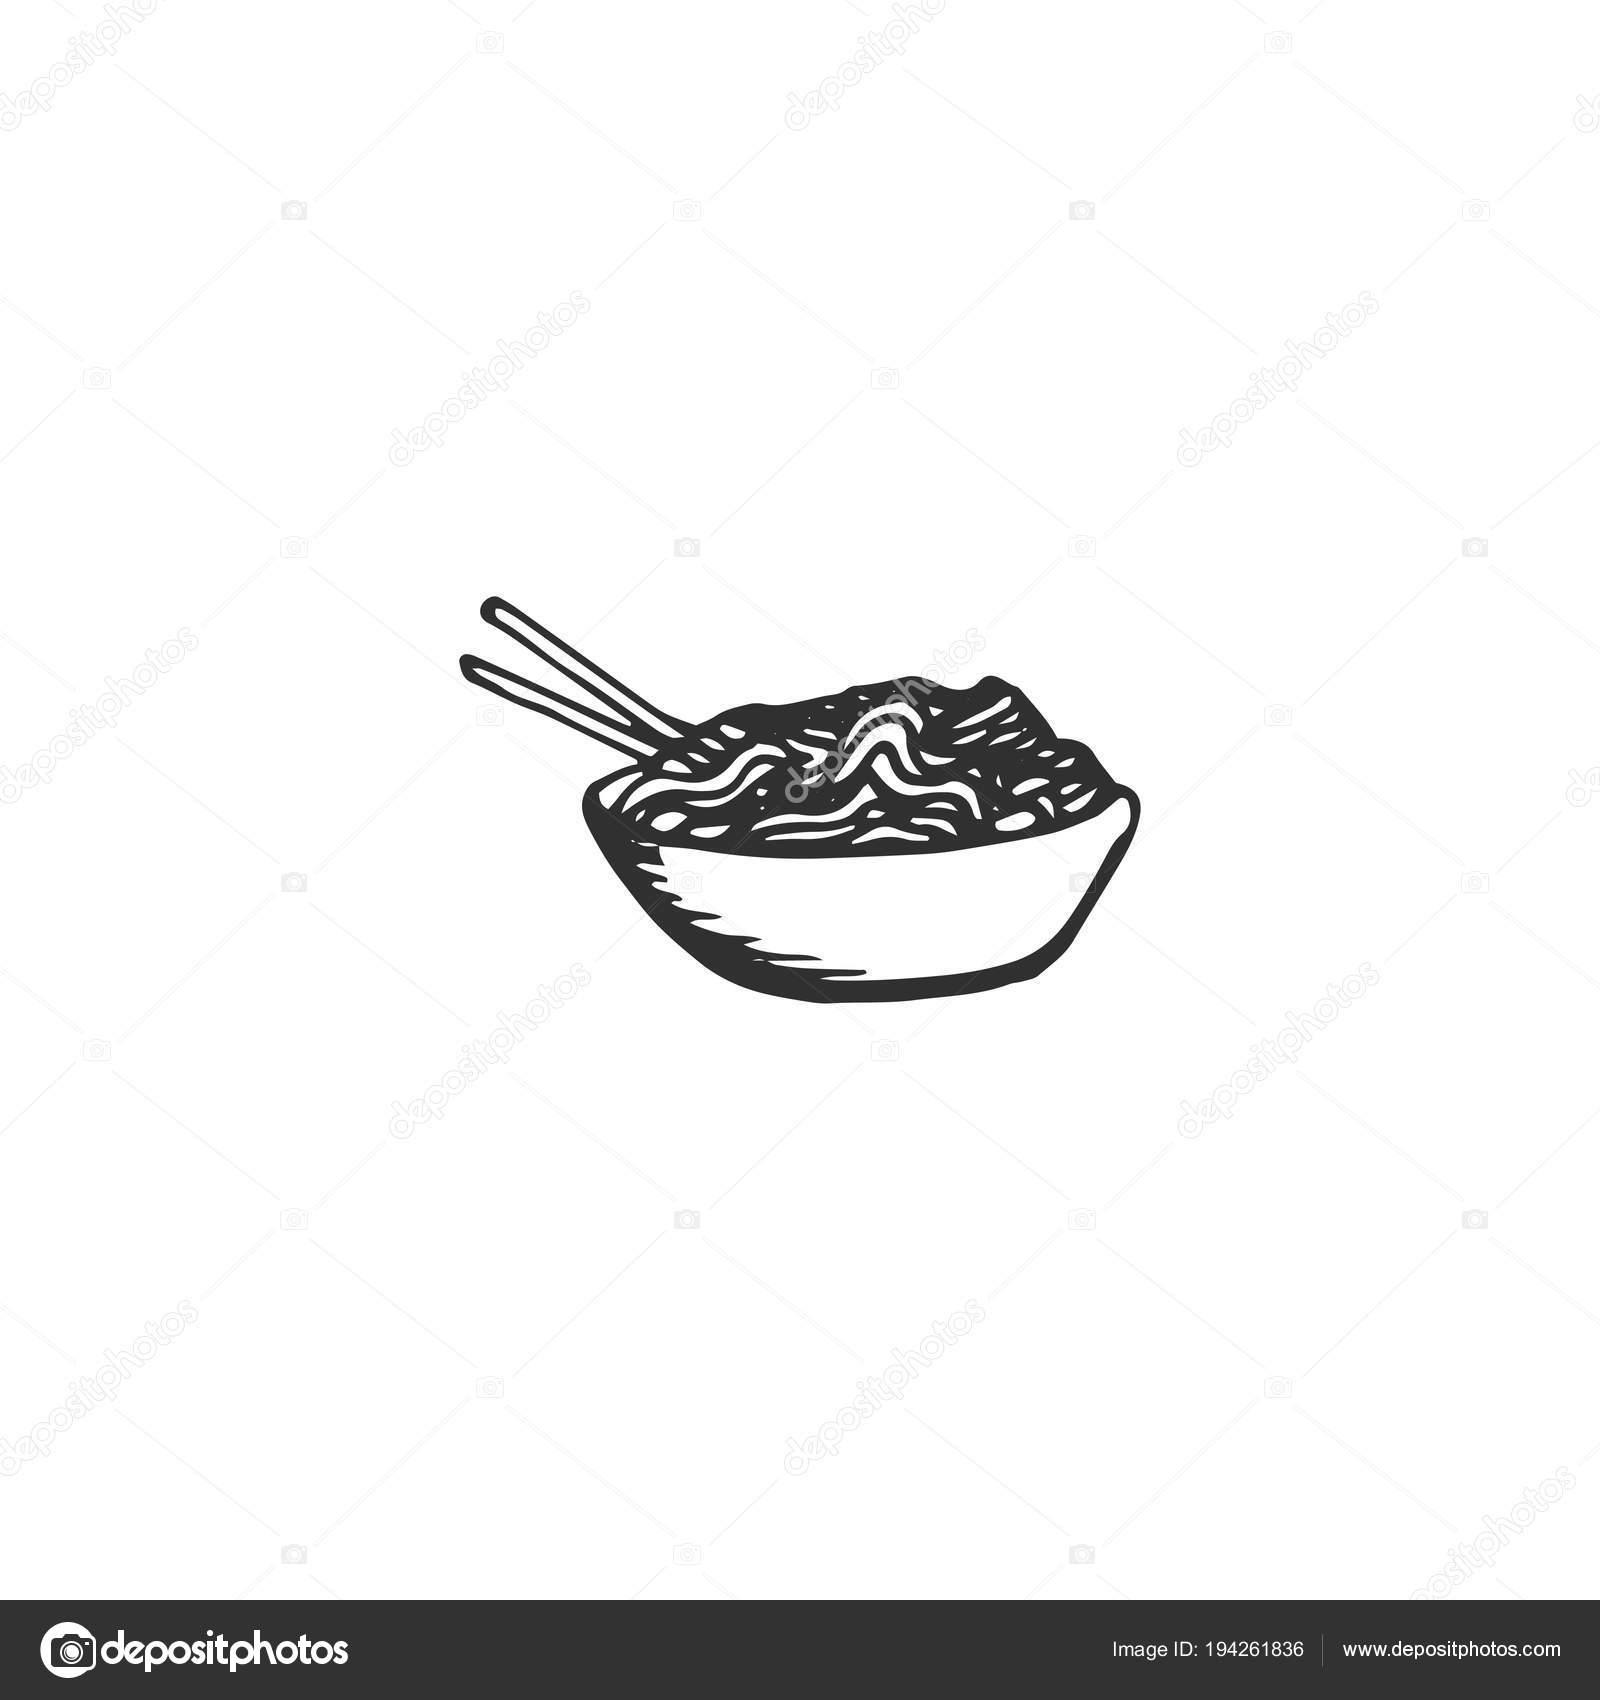 Plate Noodles Chopsticks Vector Draw Stock Vector C F Dor 194261836